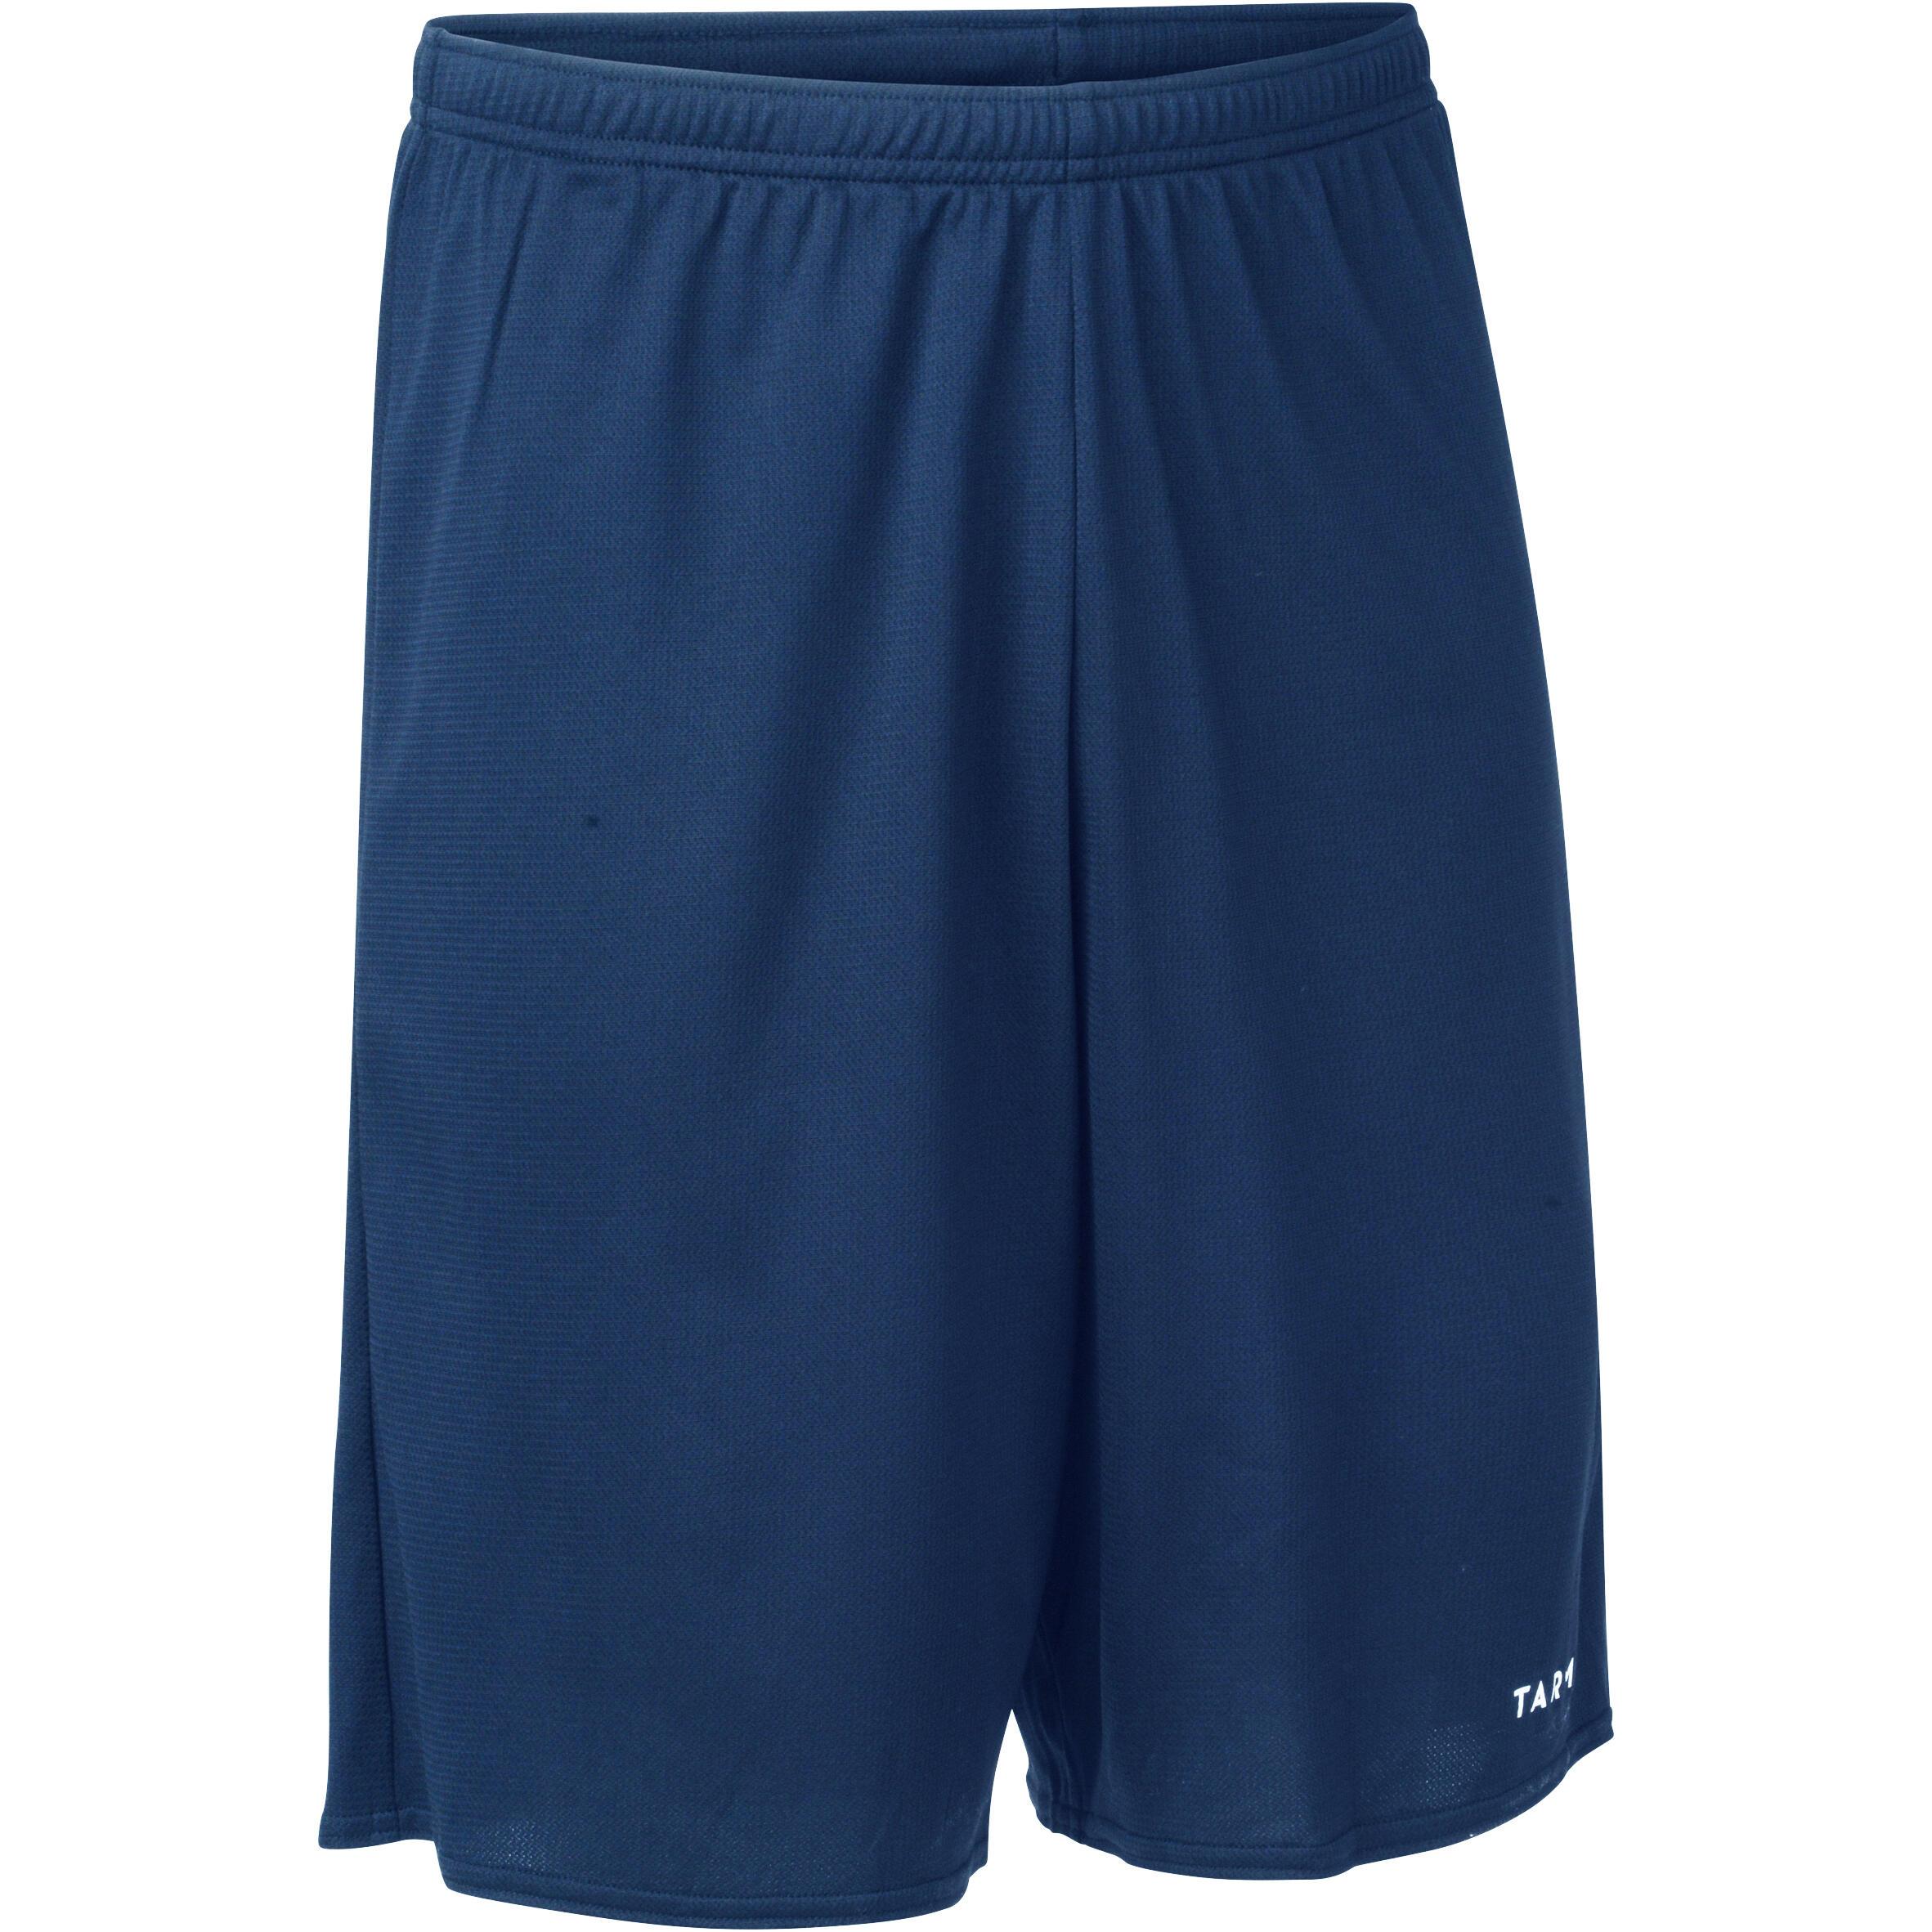 ADULT BASKETBALL SHORTS SH100 NAVY BLUE